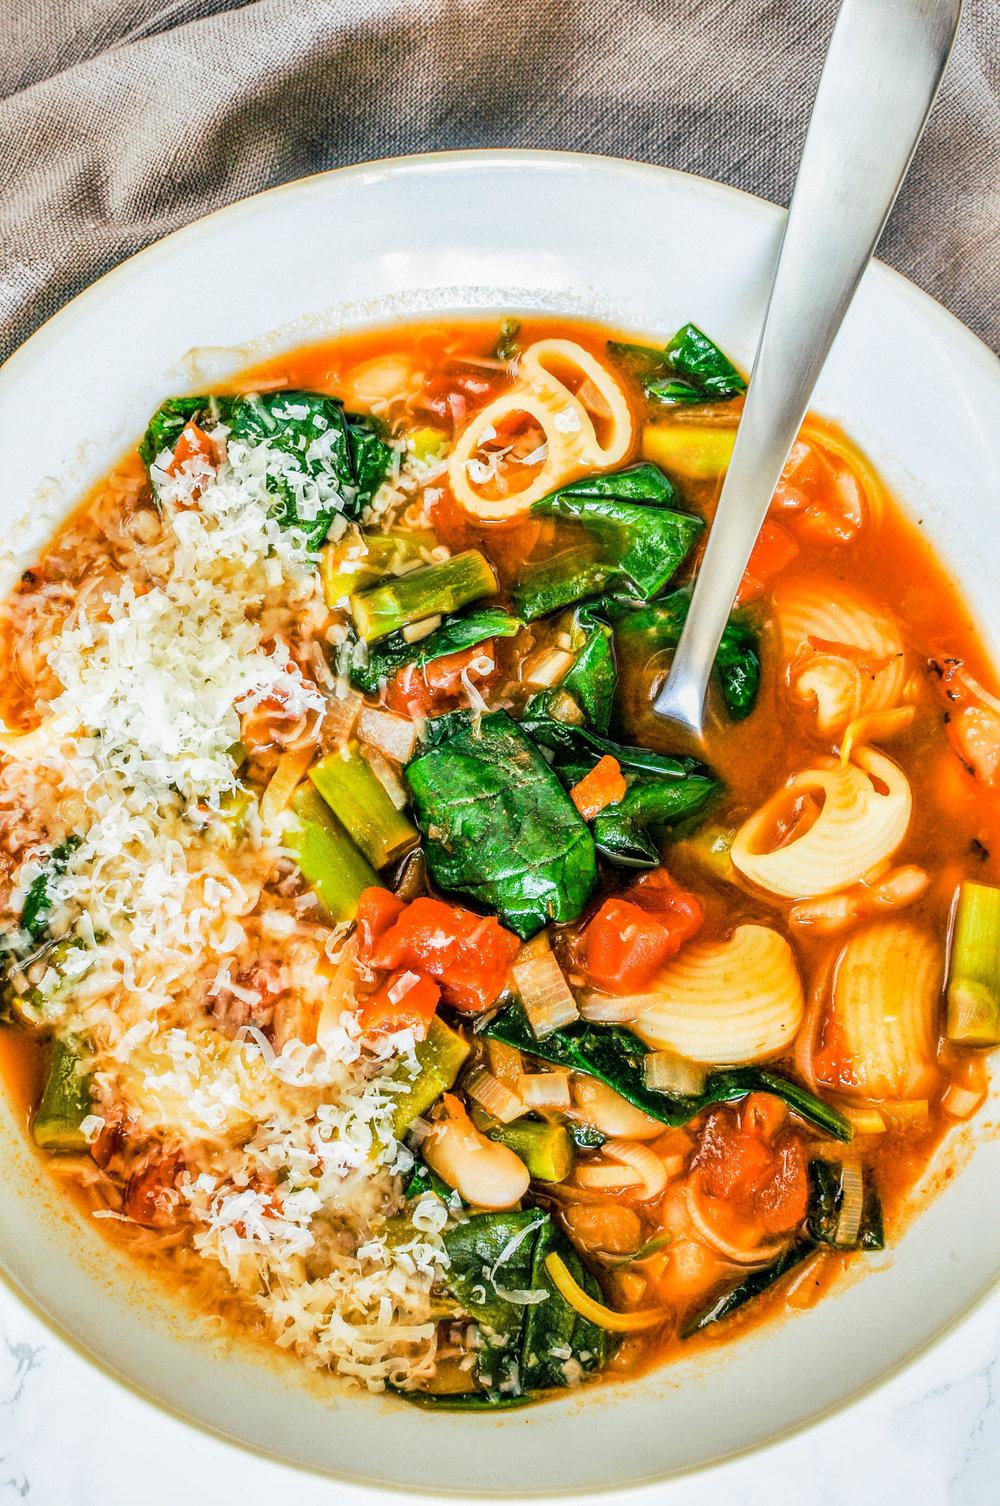 Springtime Minestrone Soup - a delicious, vegetarian dinner recipe.